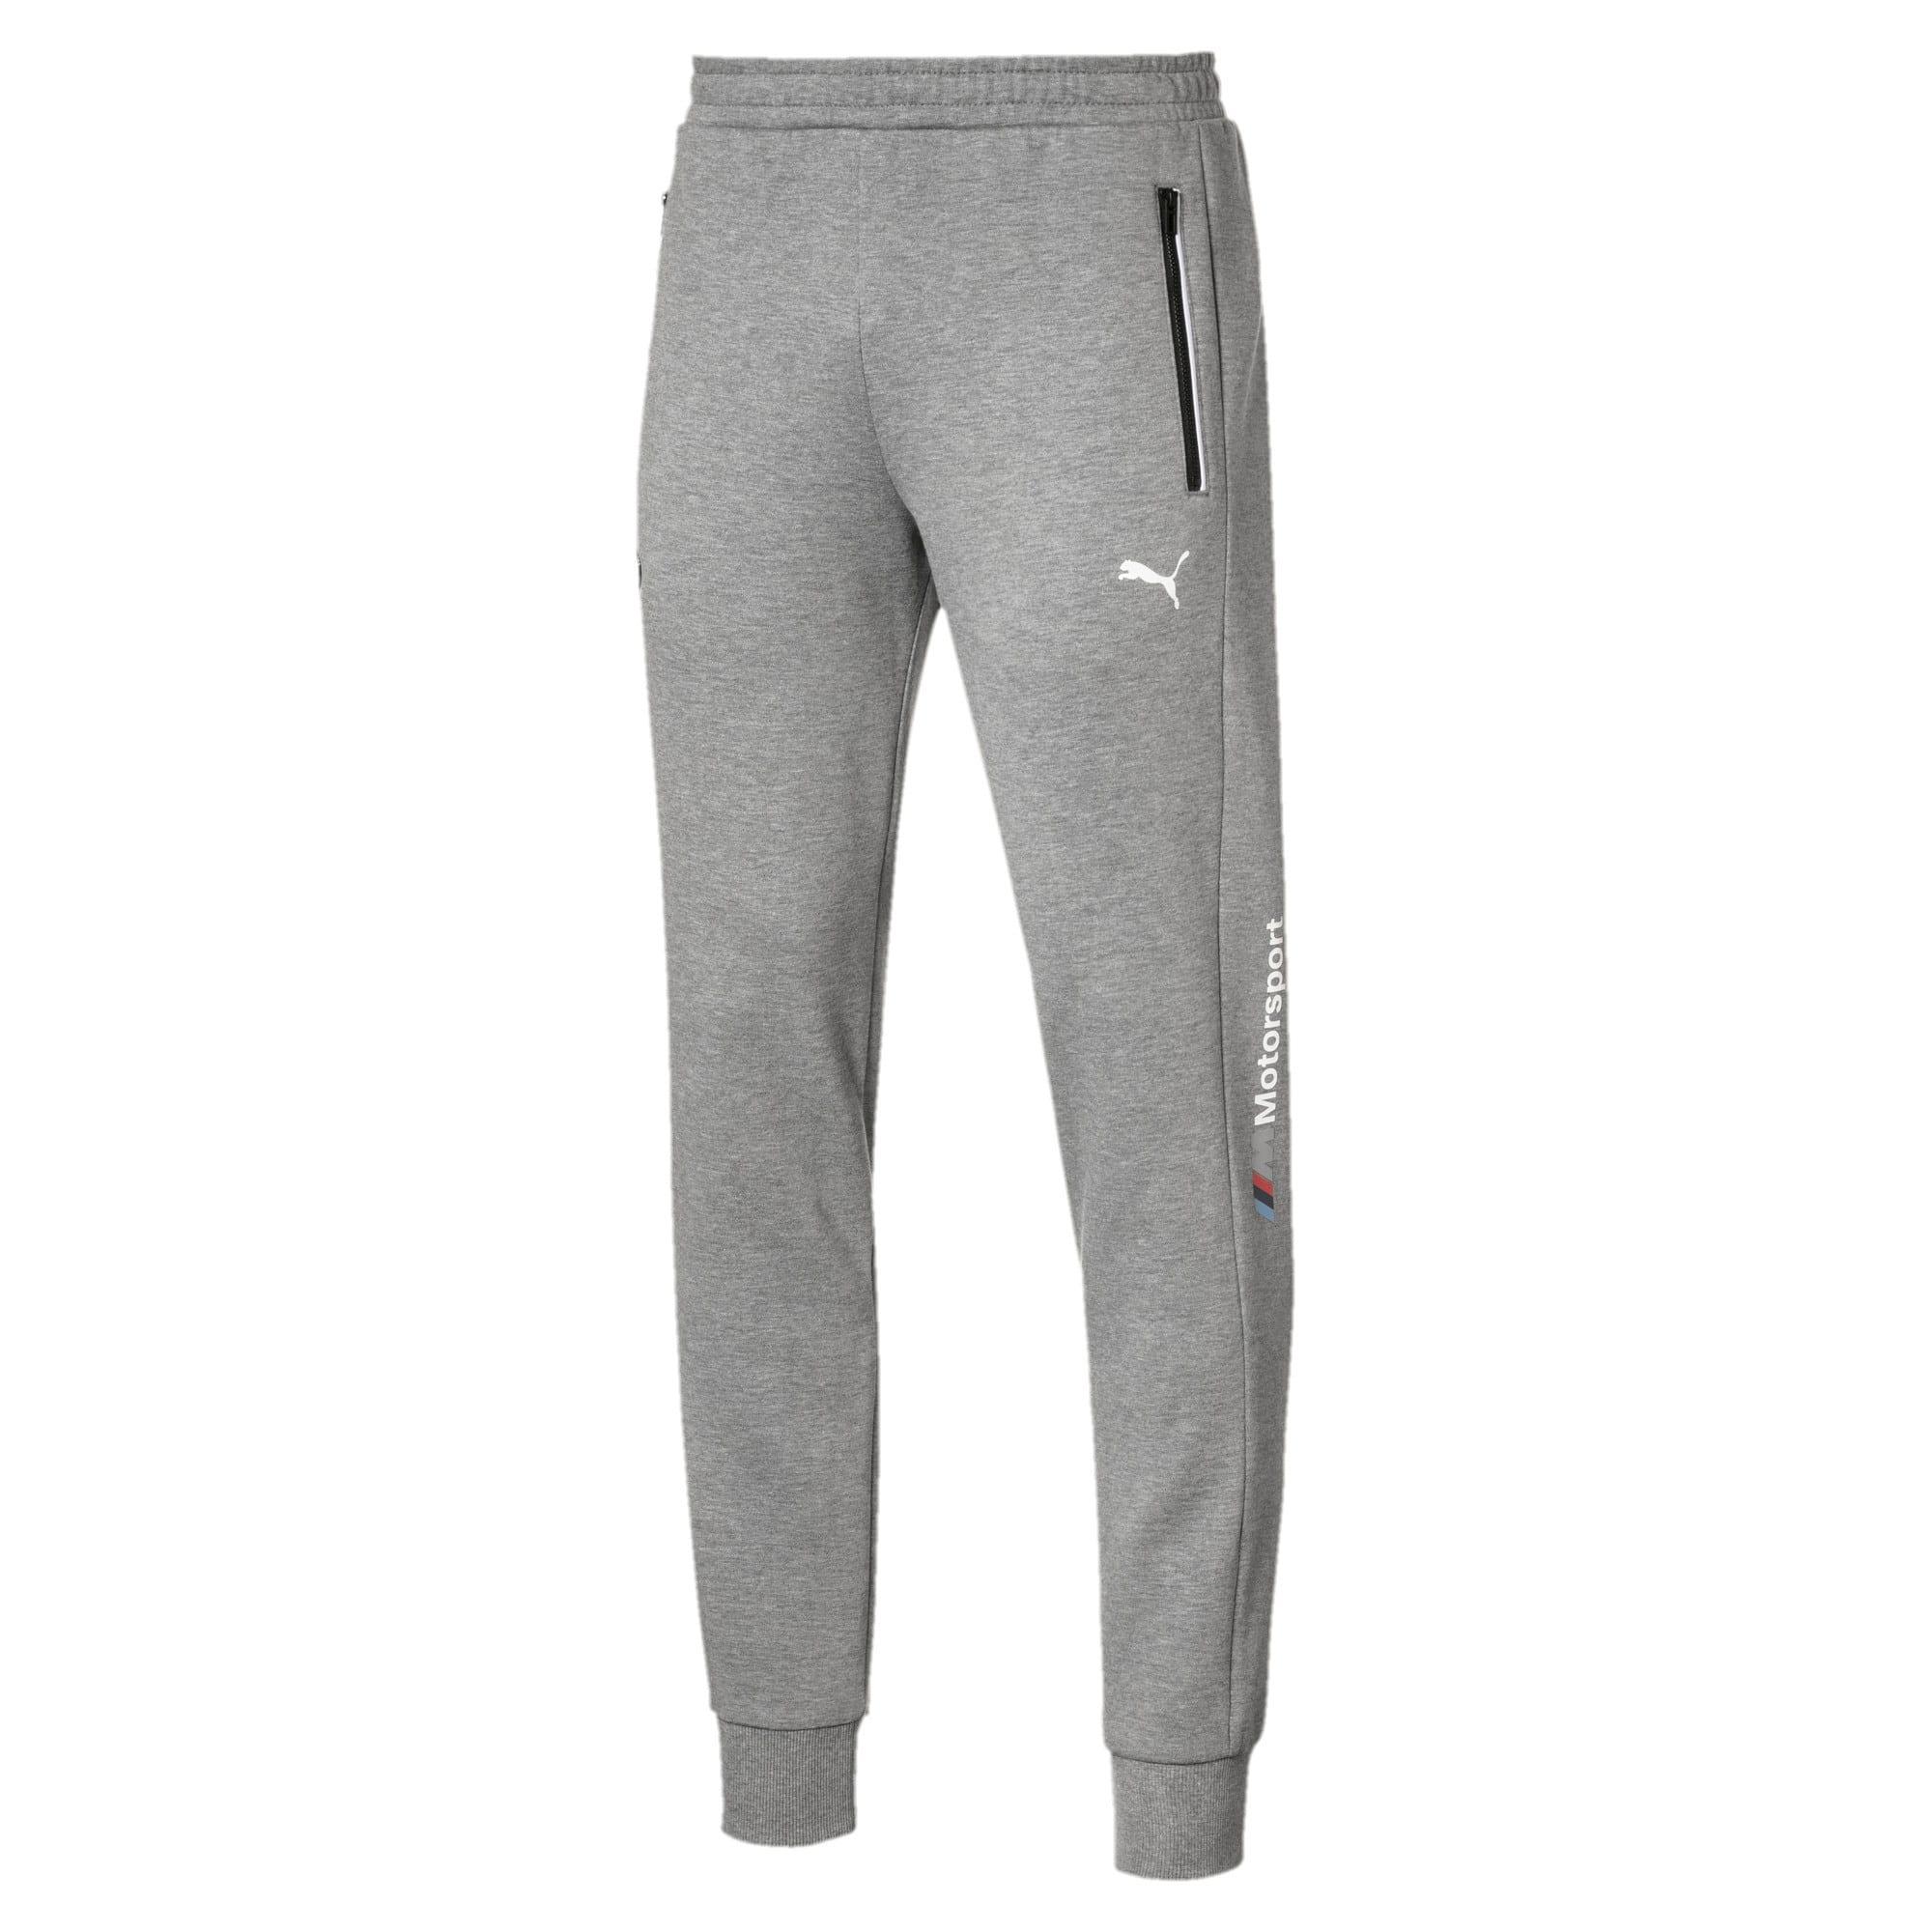 Thumbnail 1 of BMW M Motorsport Knitted Men's Sweatpants, Medium Gray Heather, medium